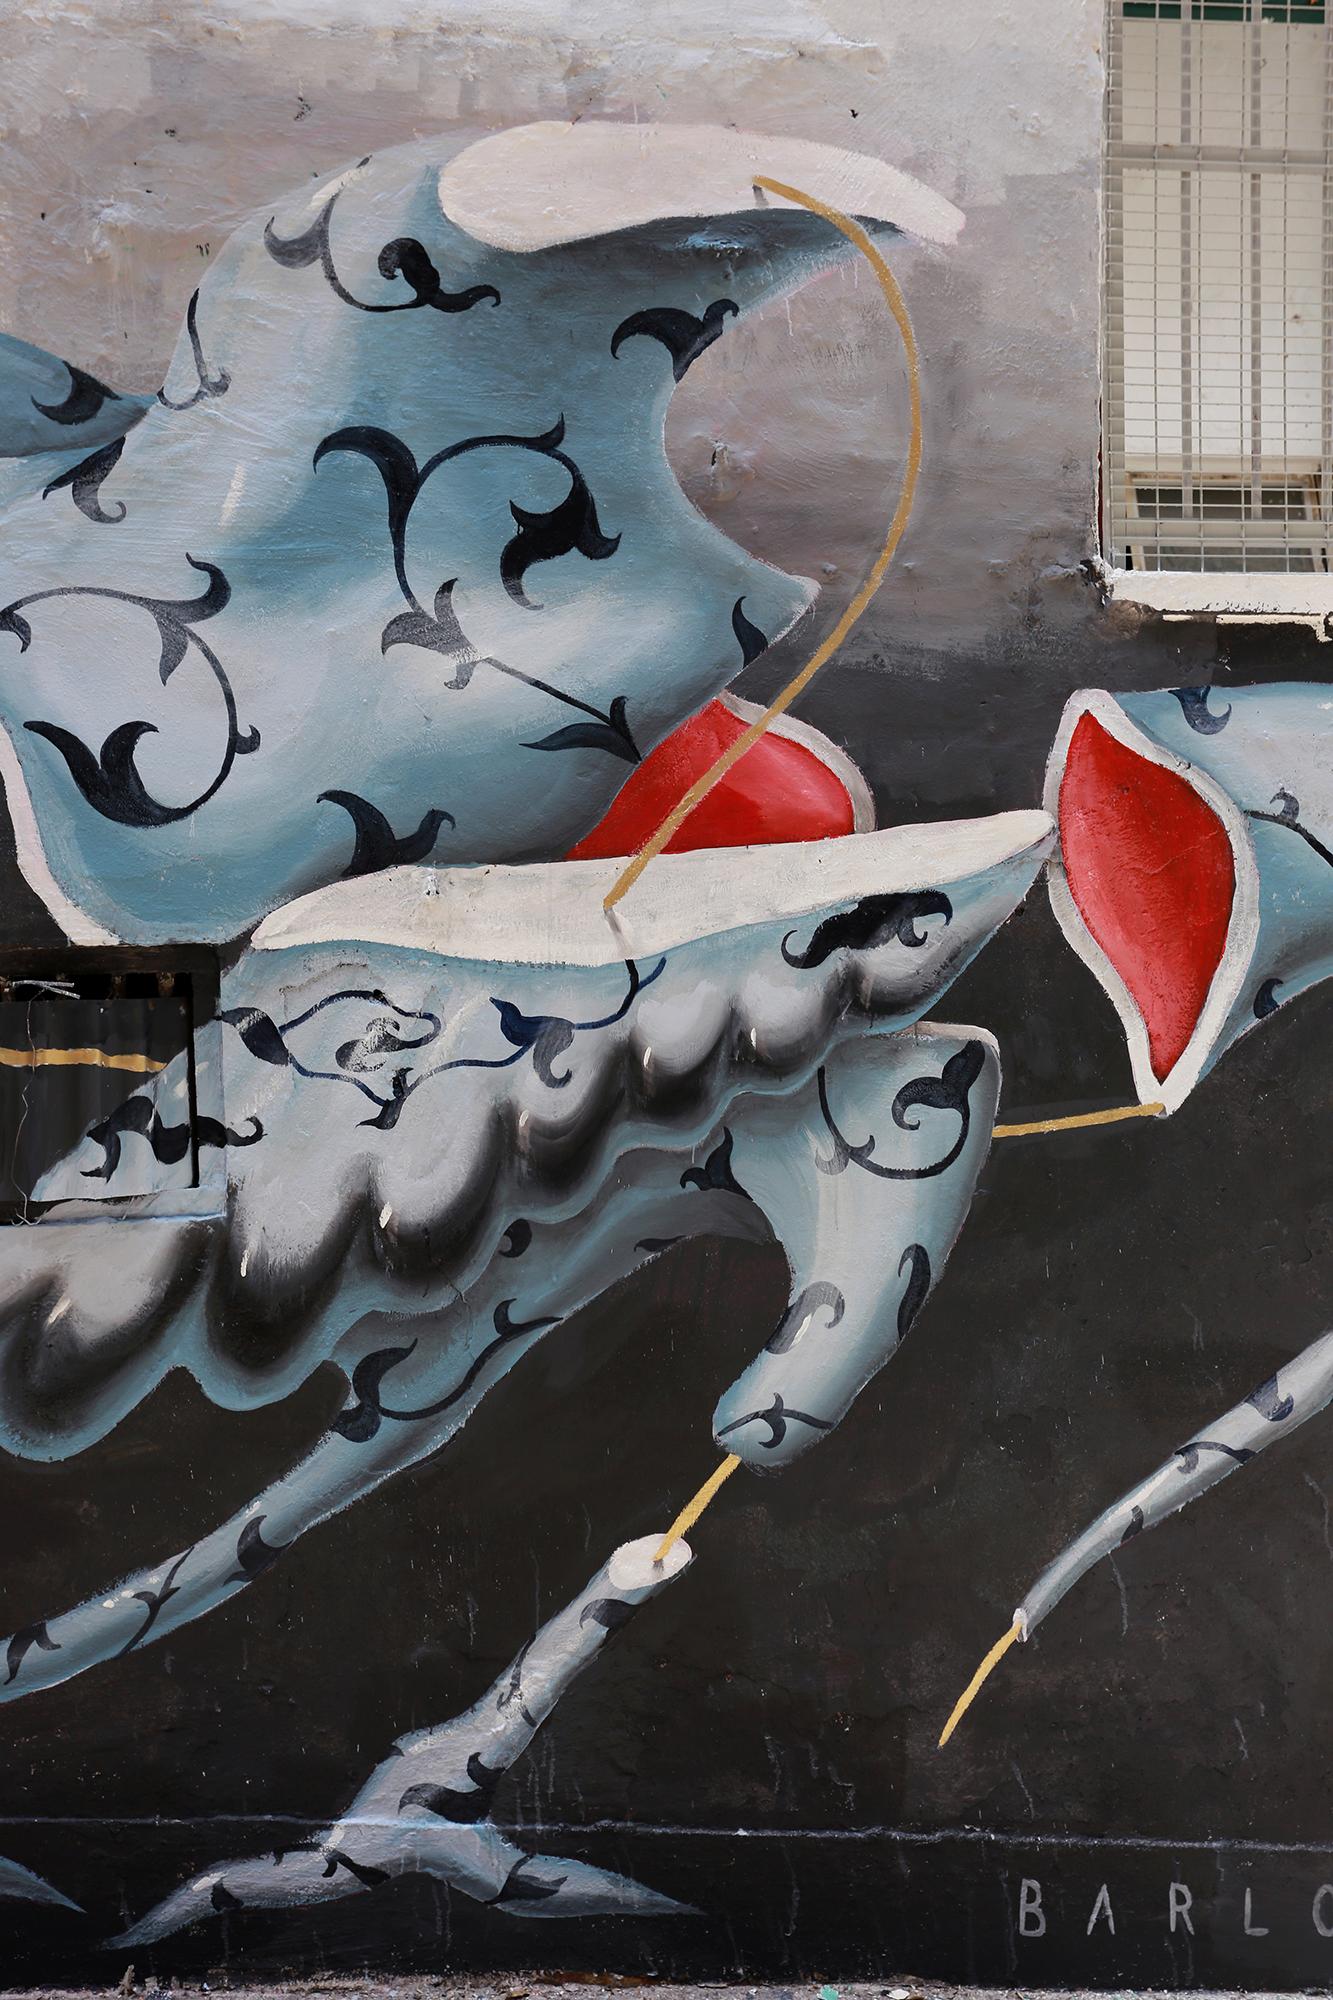 Barlo HkWalls street art Hong Kong